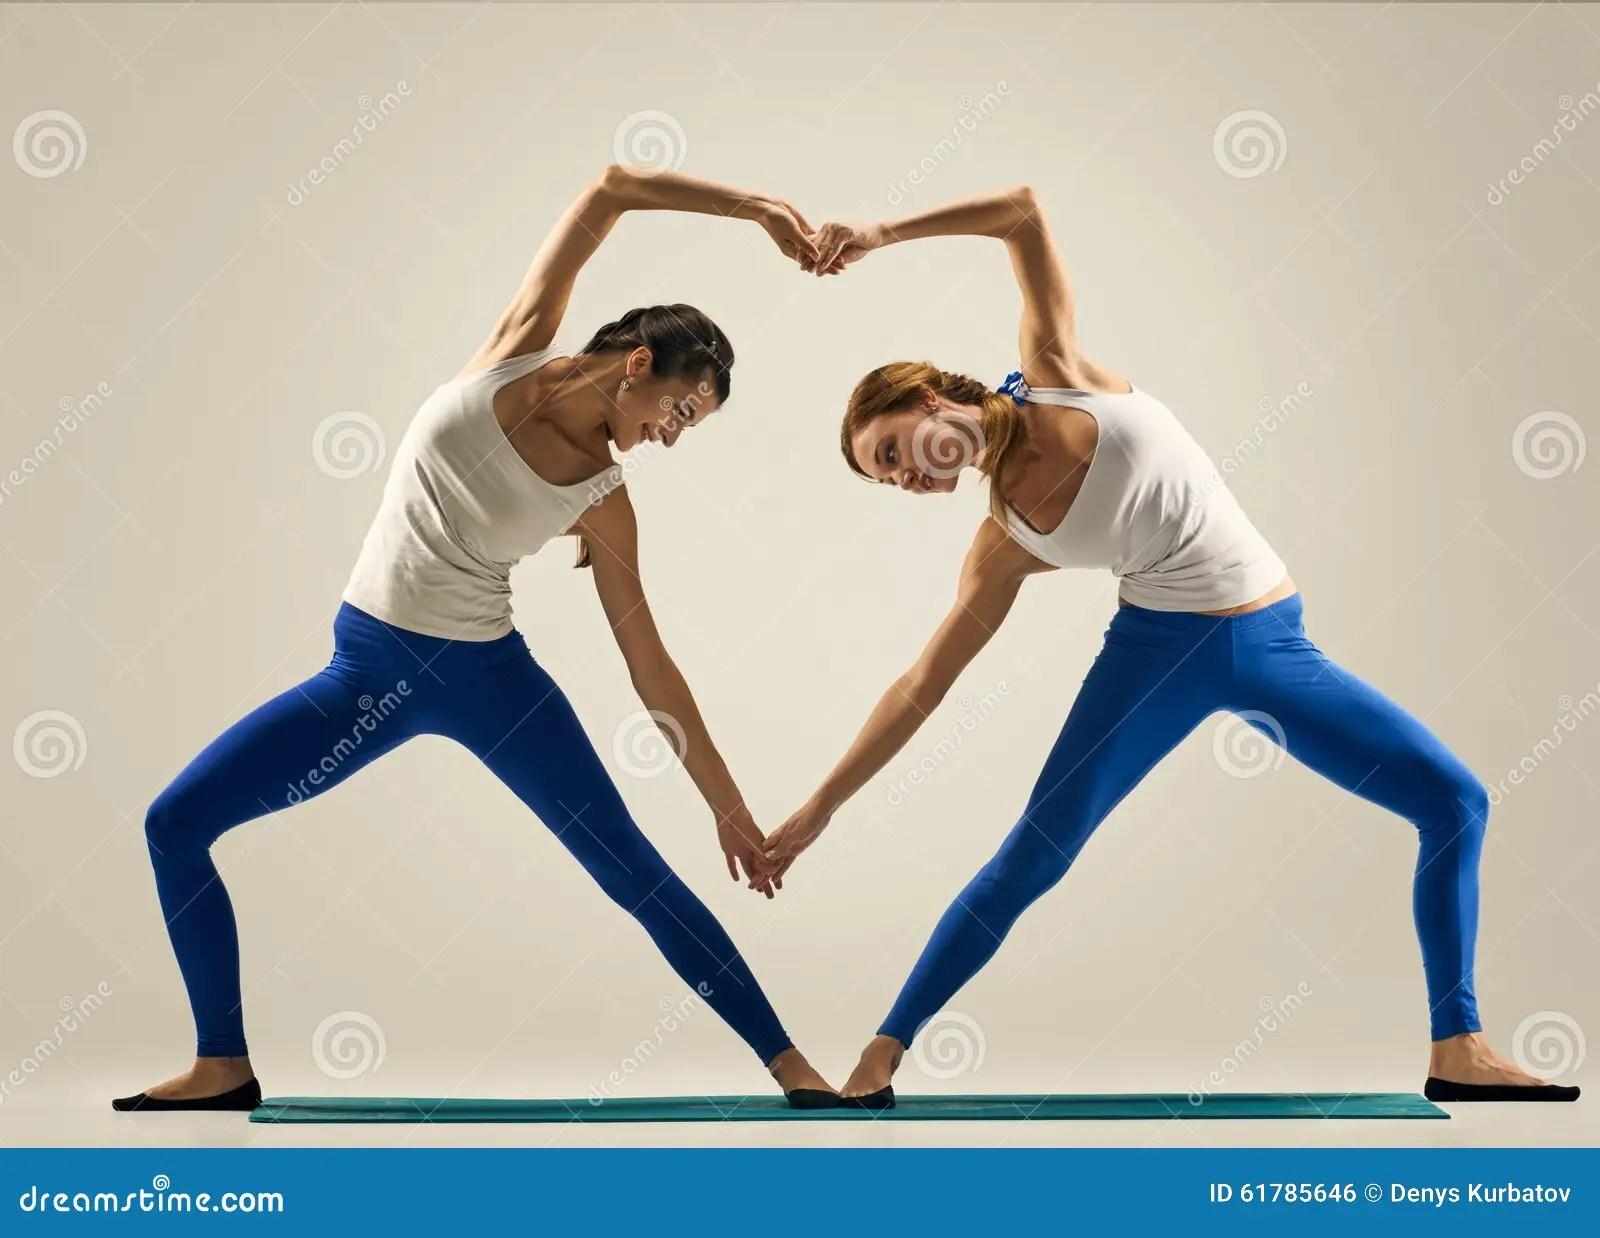 Partner Yoga Poses 2 People